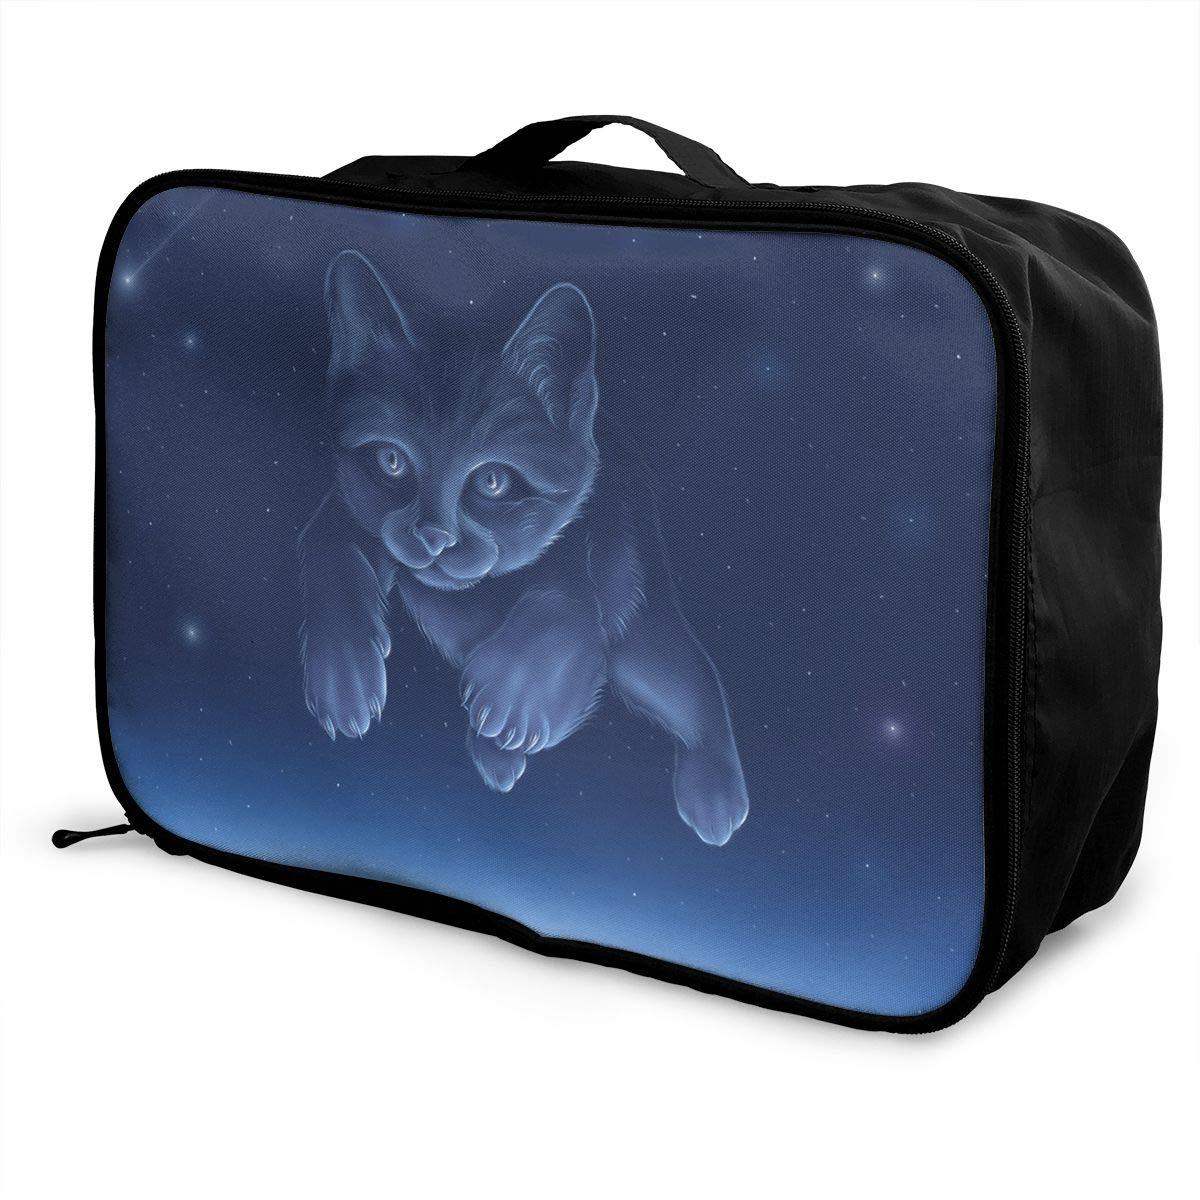 Travel Luggage Duffle Bag Lightweight Portable Handbag Cat Large Capacity Waterproof Foldable Storage Tote